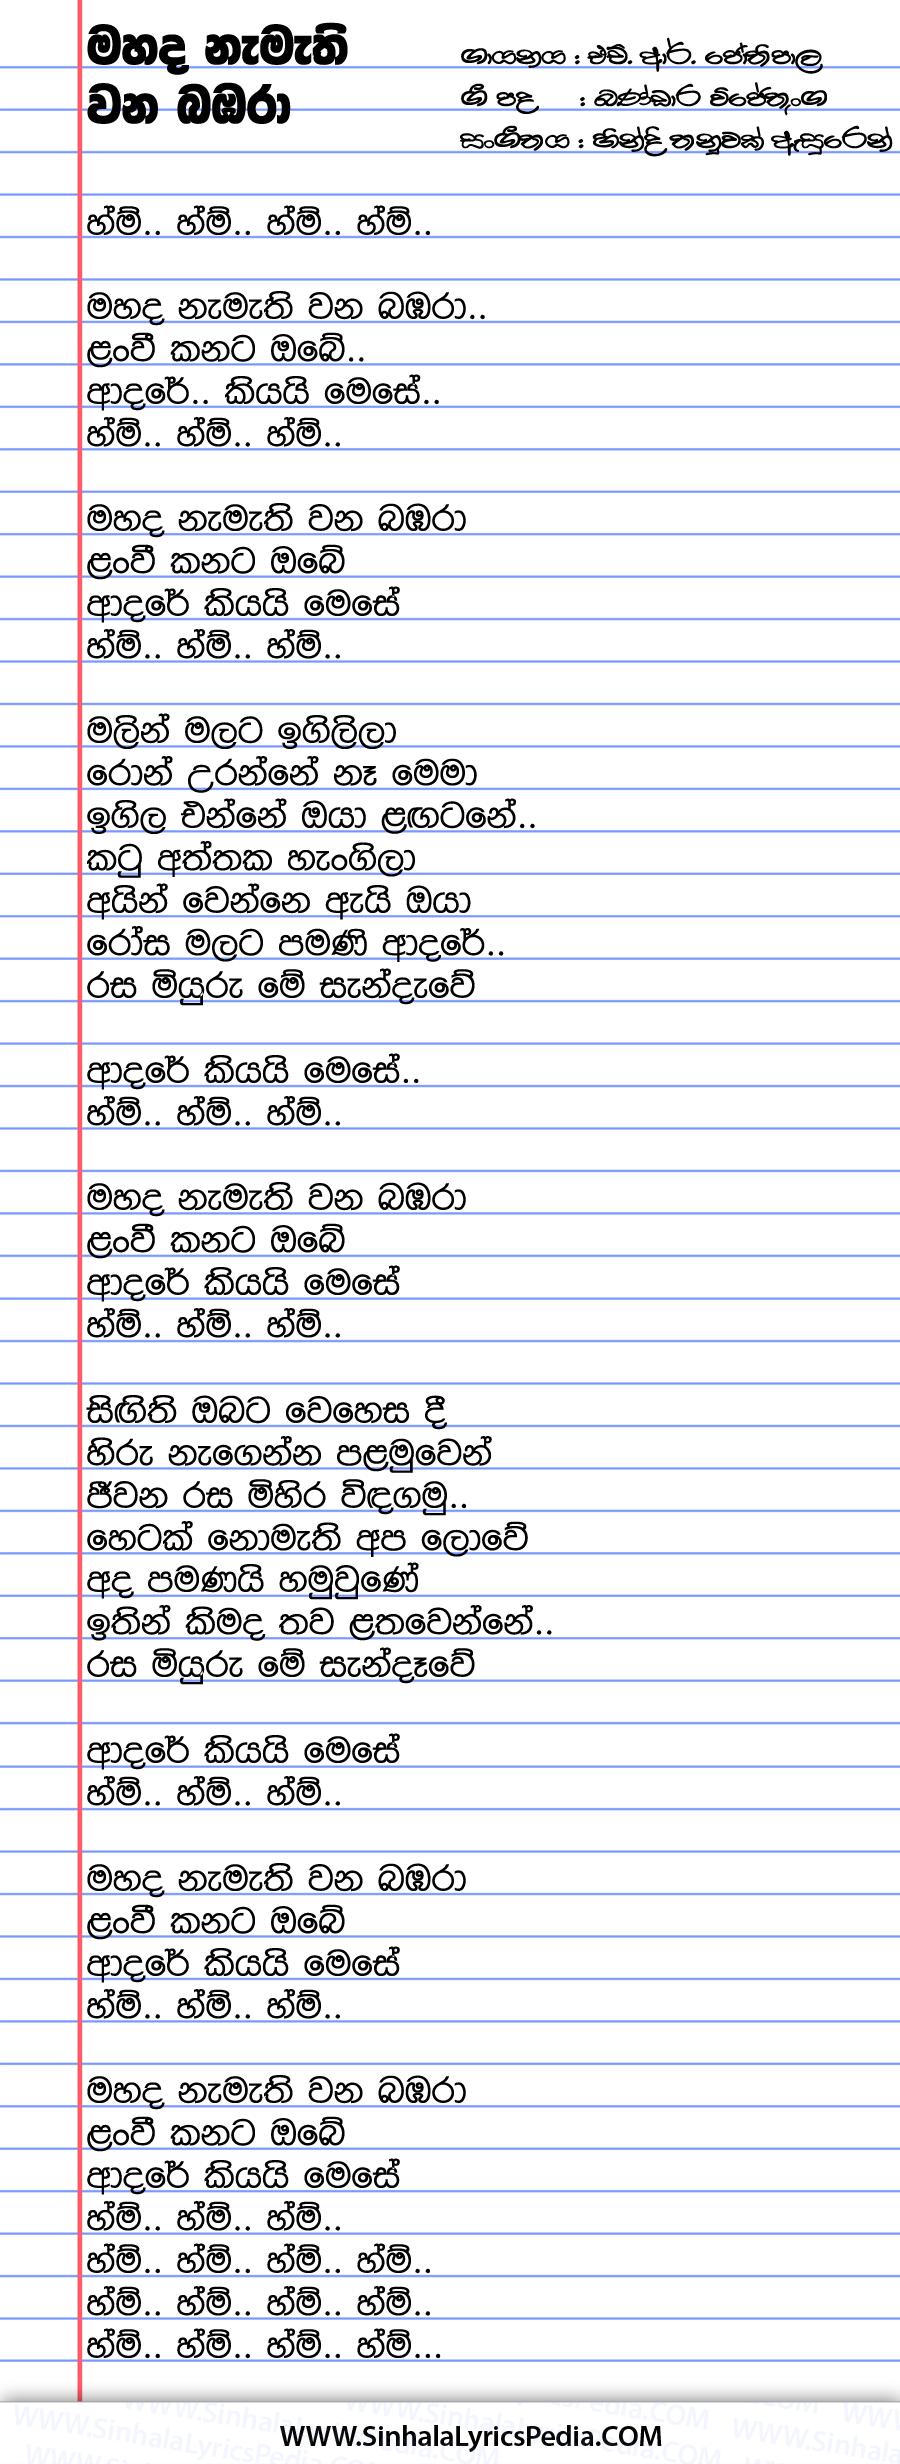 Mahada Namathi Wana Babara Lan Wee Kanata Song Lyrics